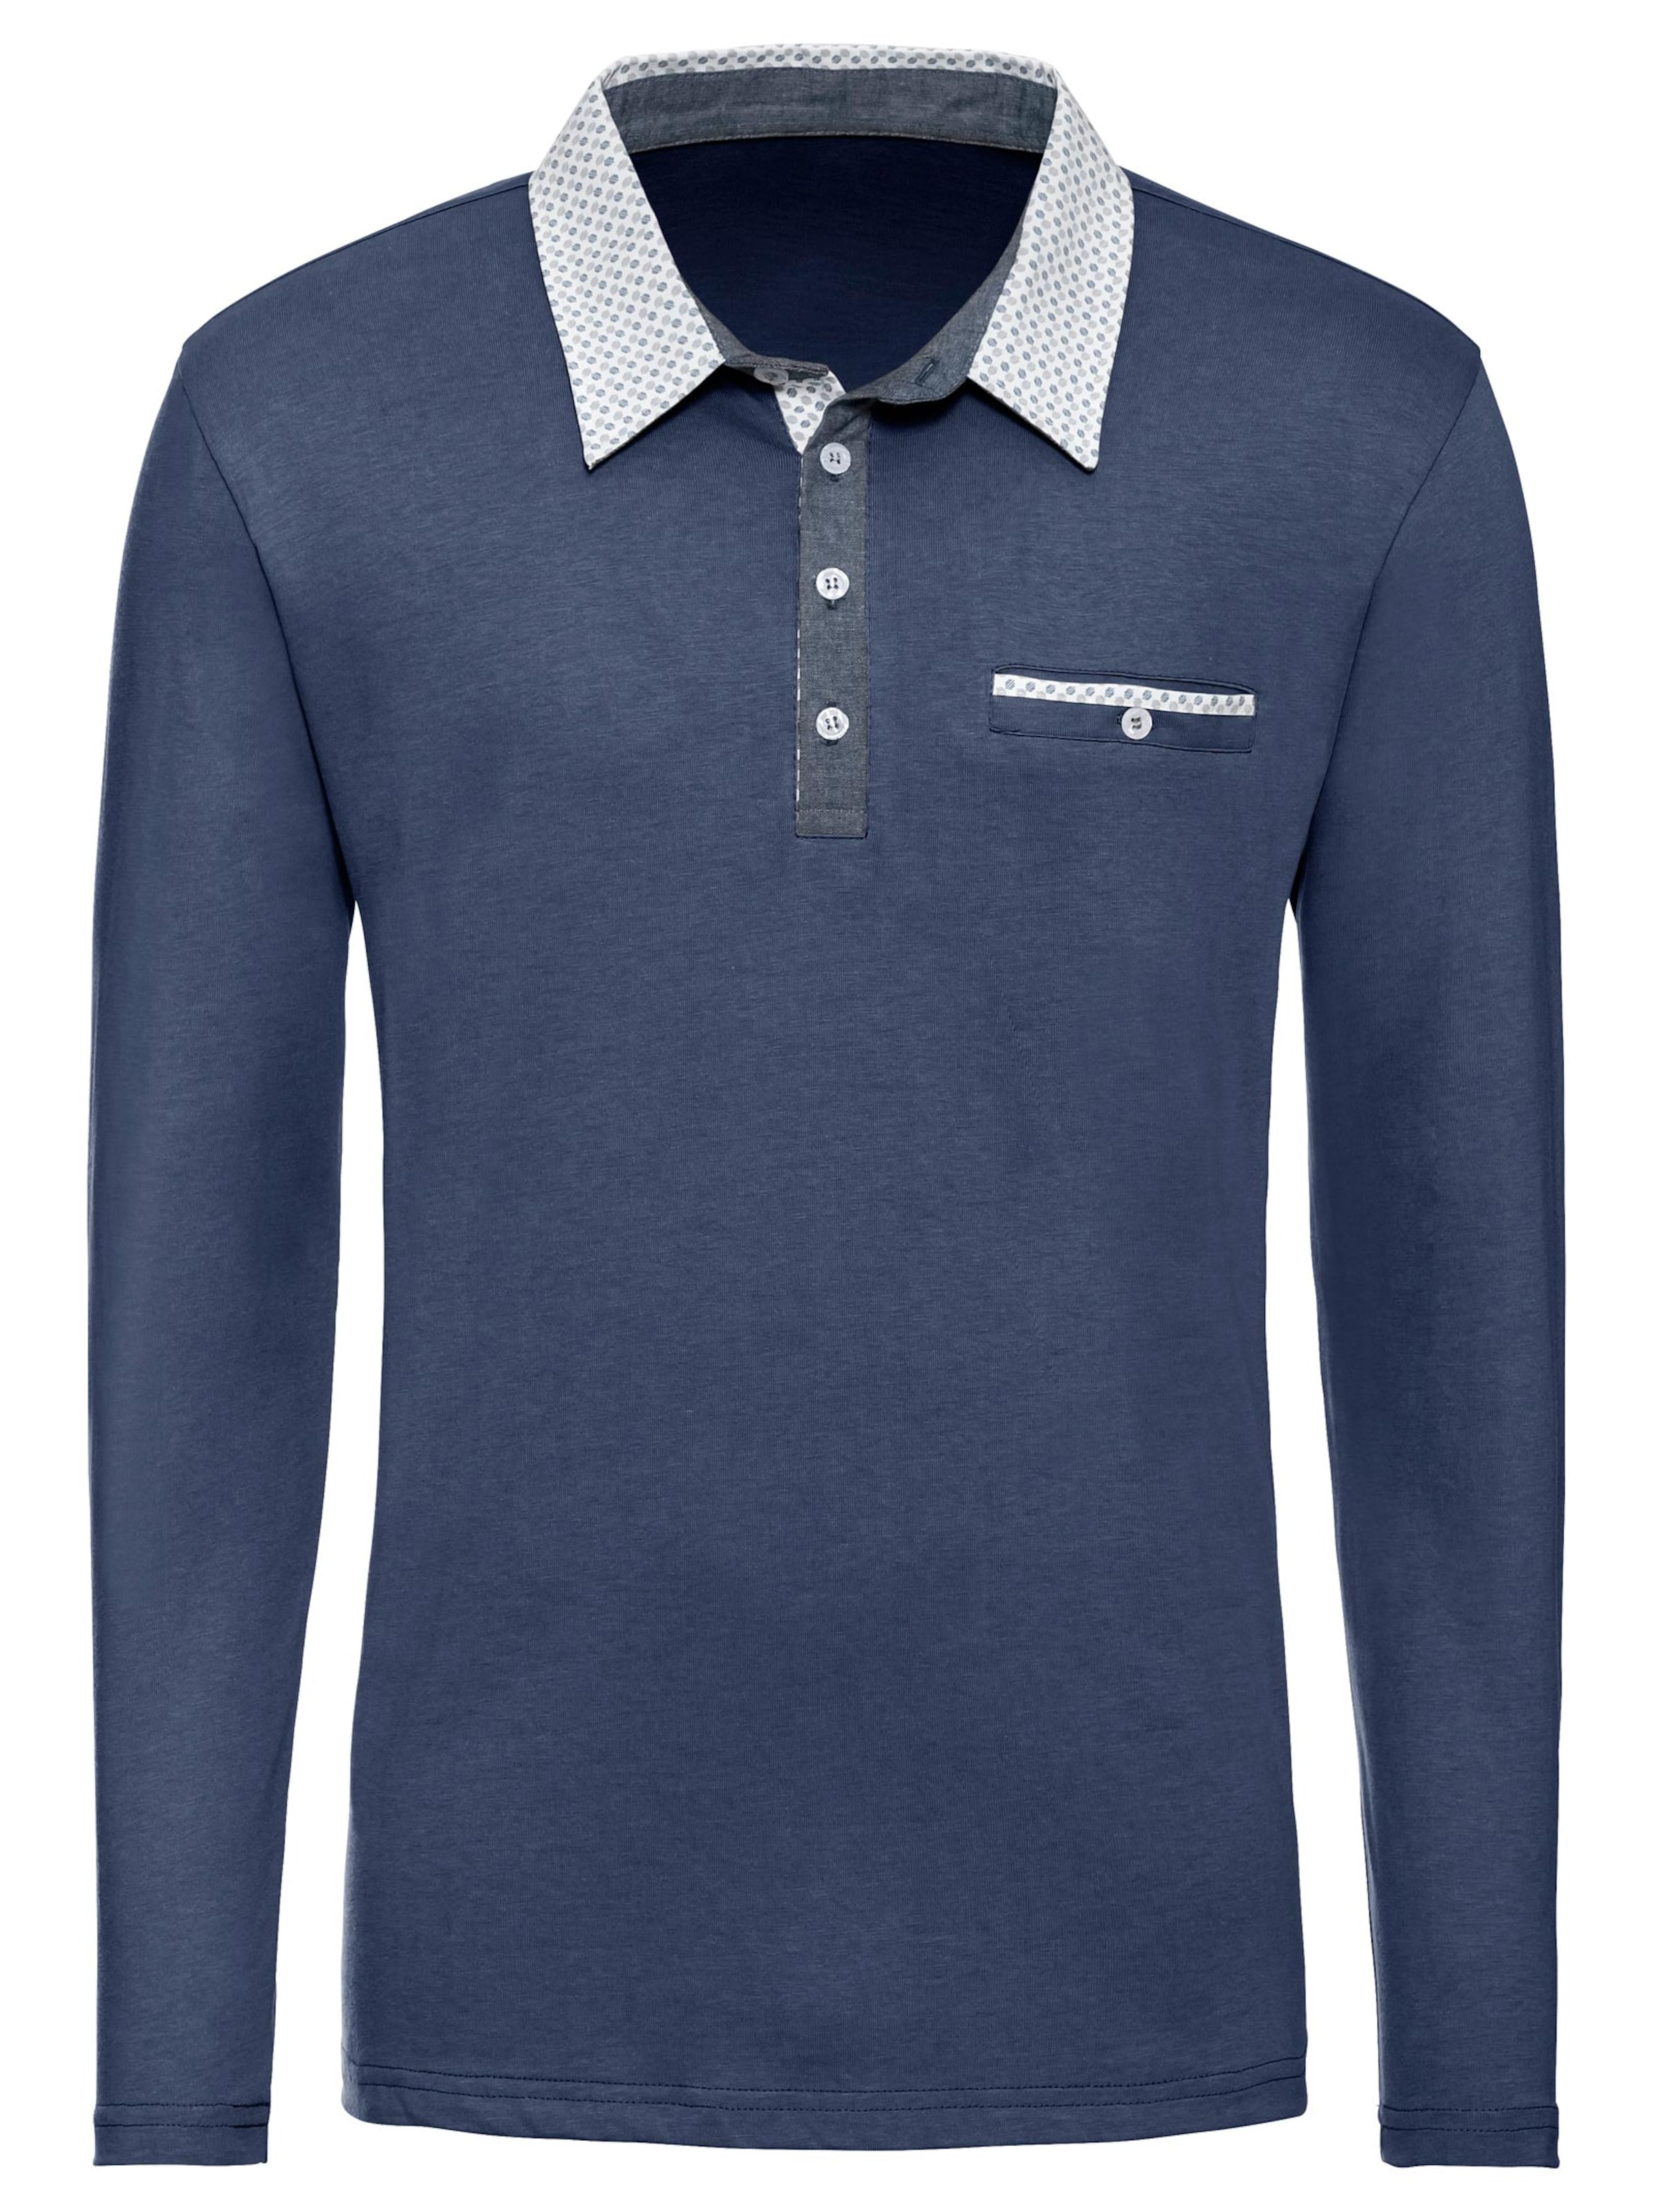 witt weiden - Herren Langarm-Shirt blau